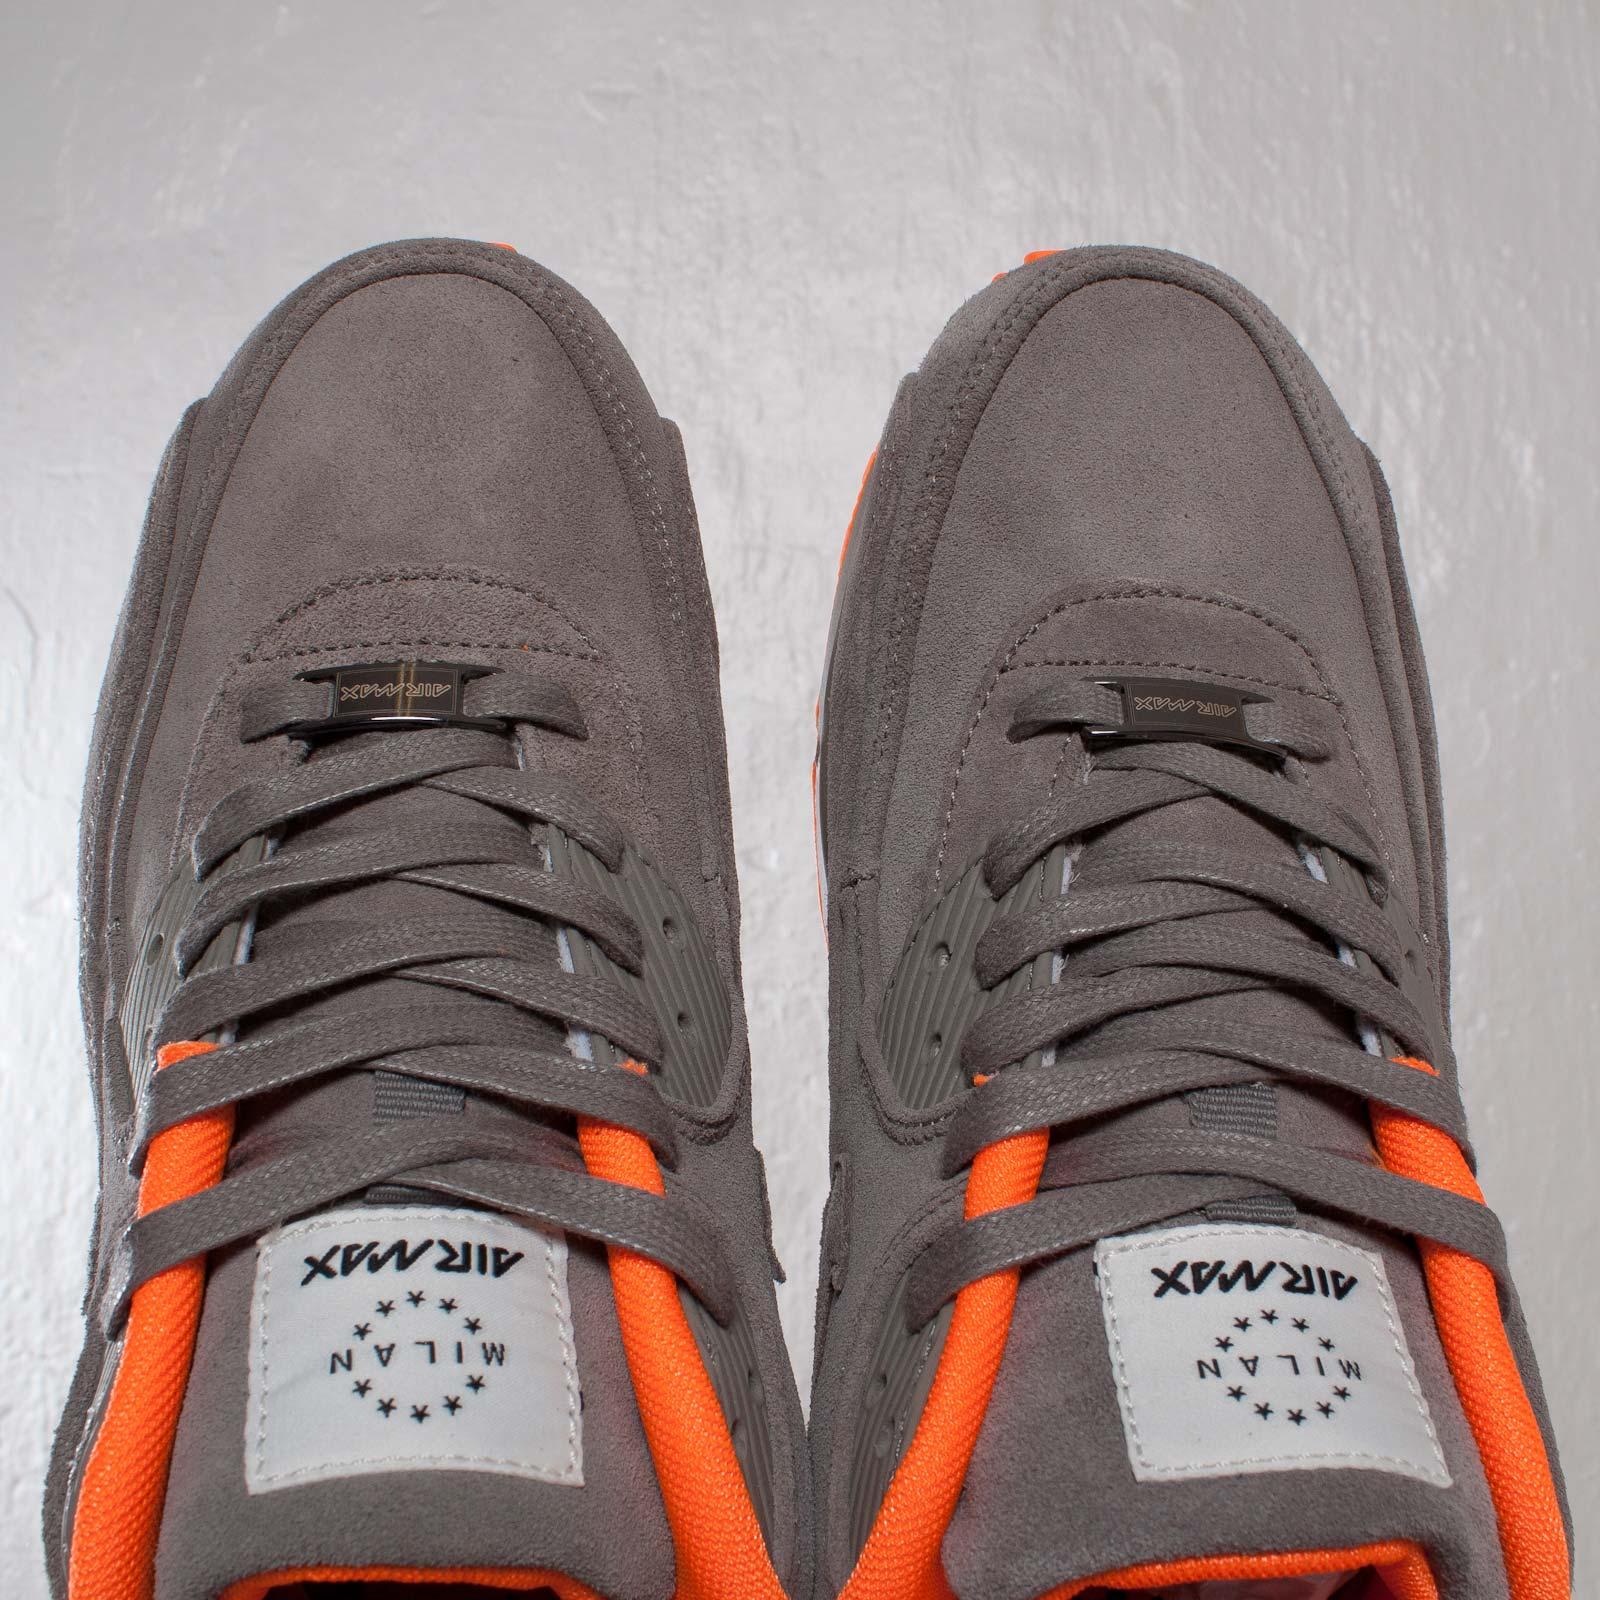 buy popular 032ae 9da50 Nike Air Max 90 Milano QS - 586848-221 - Sneakersnstuff   sneakers    streetwear online since 1999